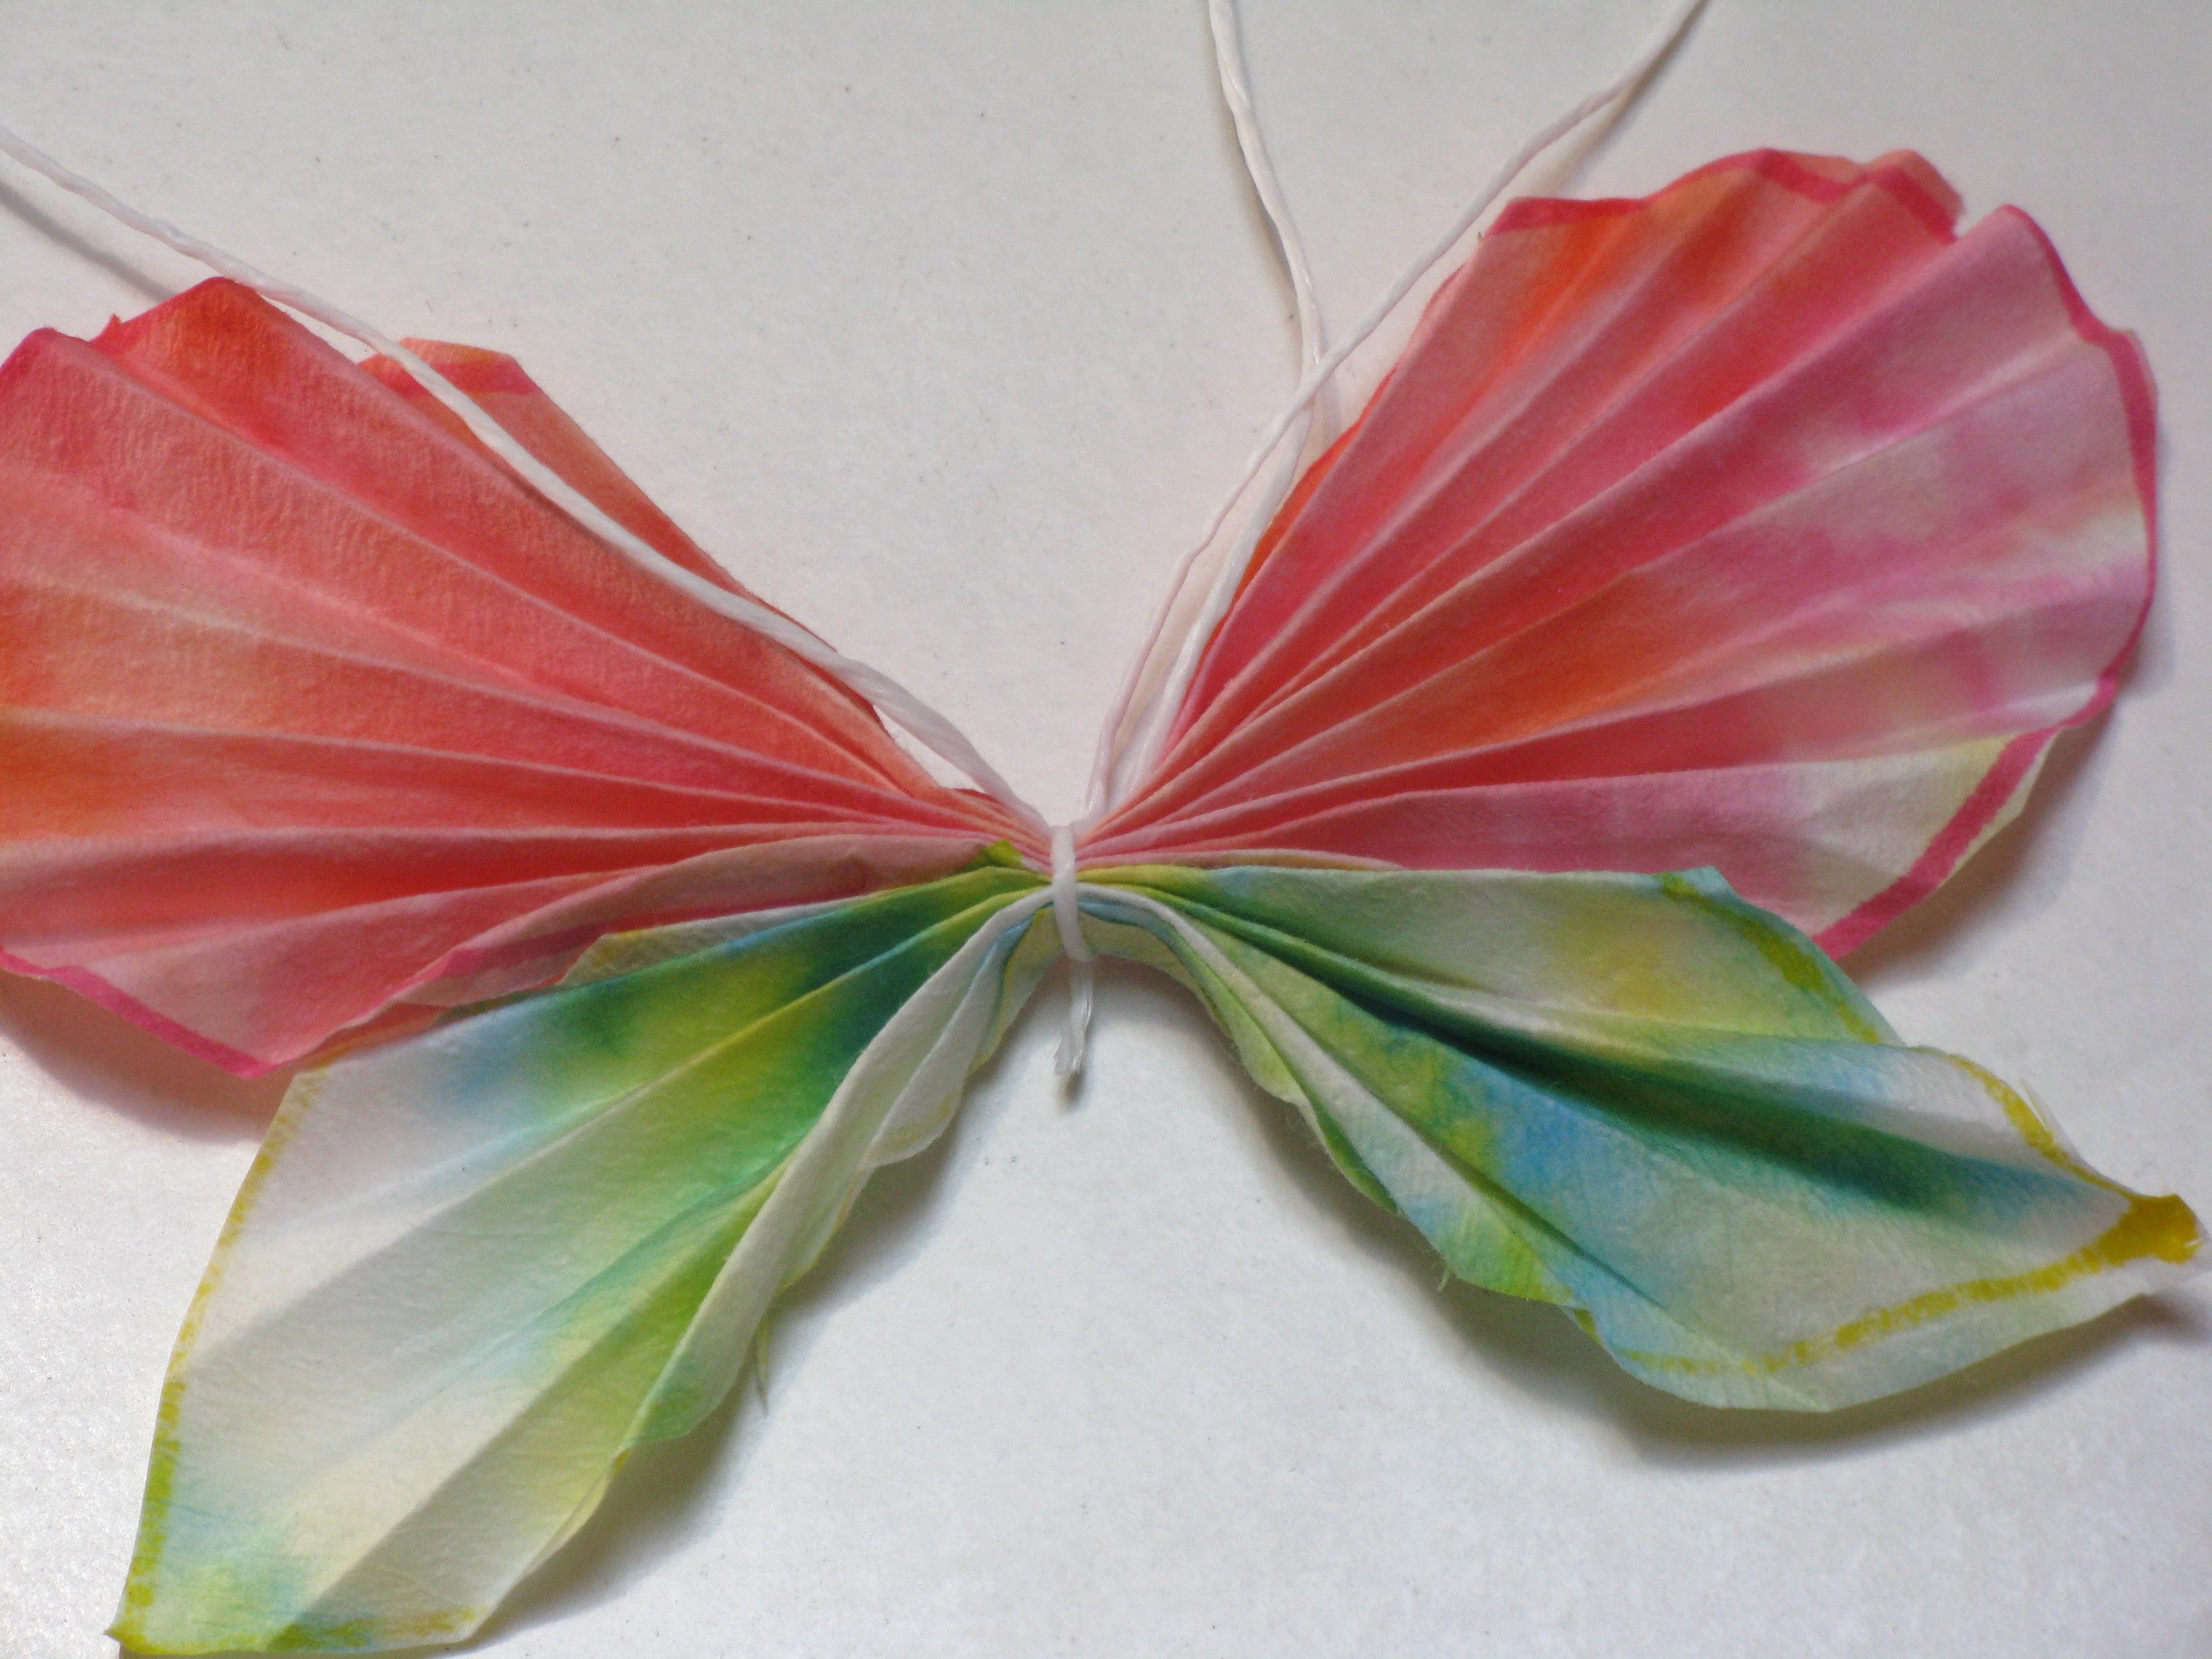 Essay on butterfly